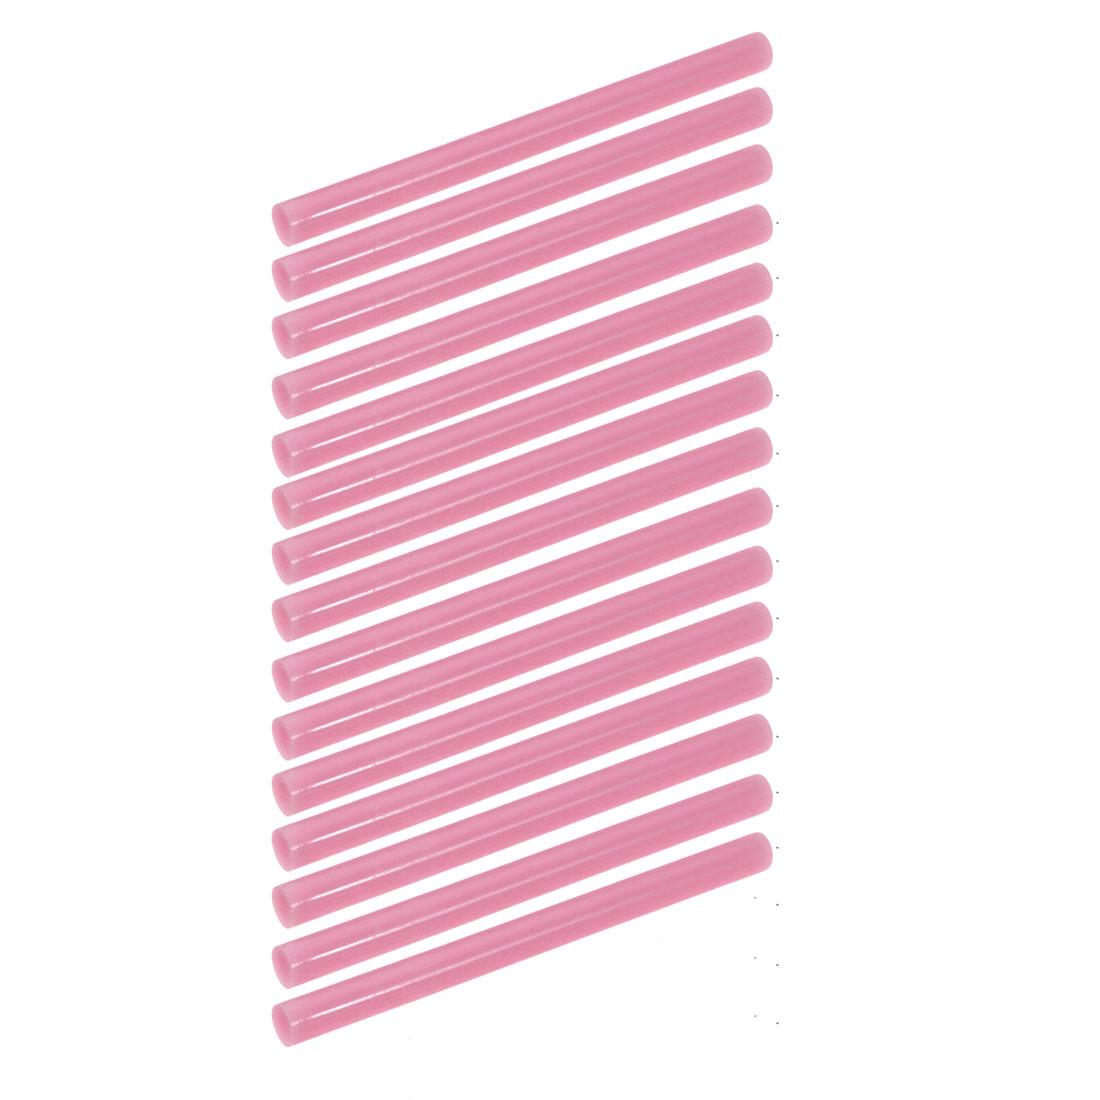 15pcs 7mm Dia 100mm Long Hot Melt Glue Adhesive Stick Light Pink